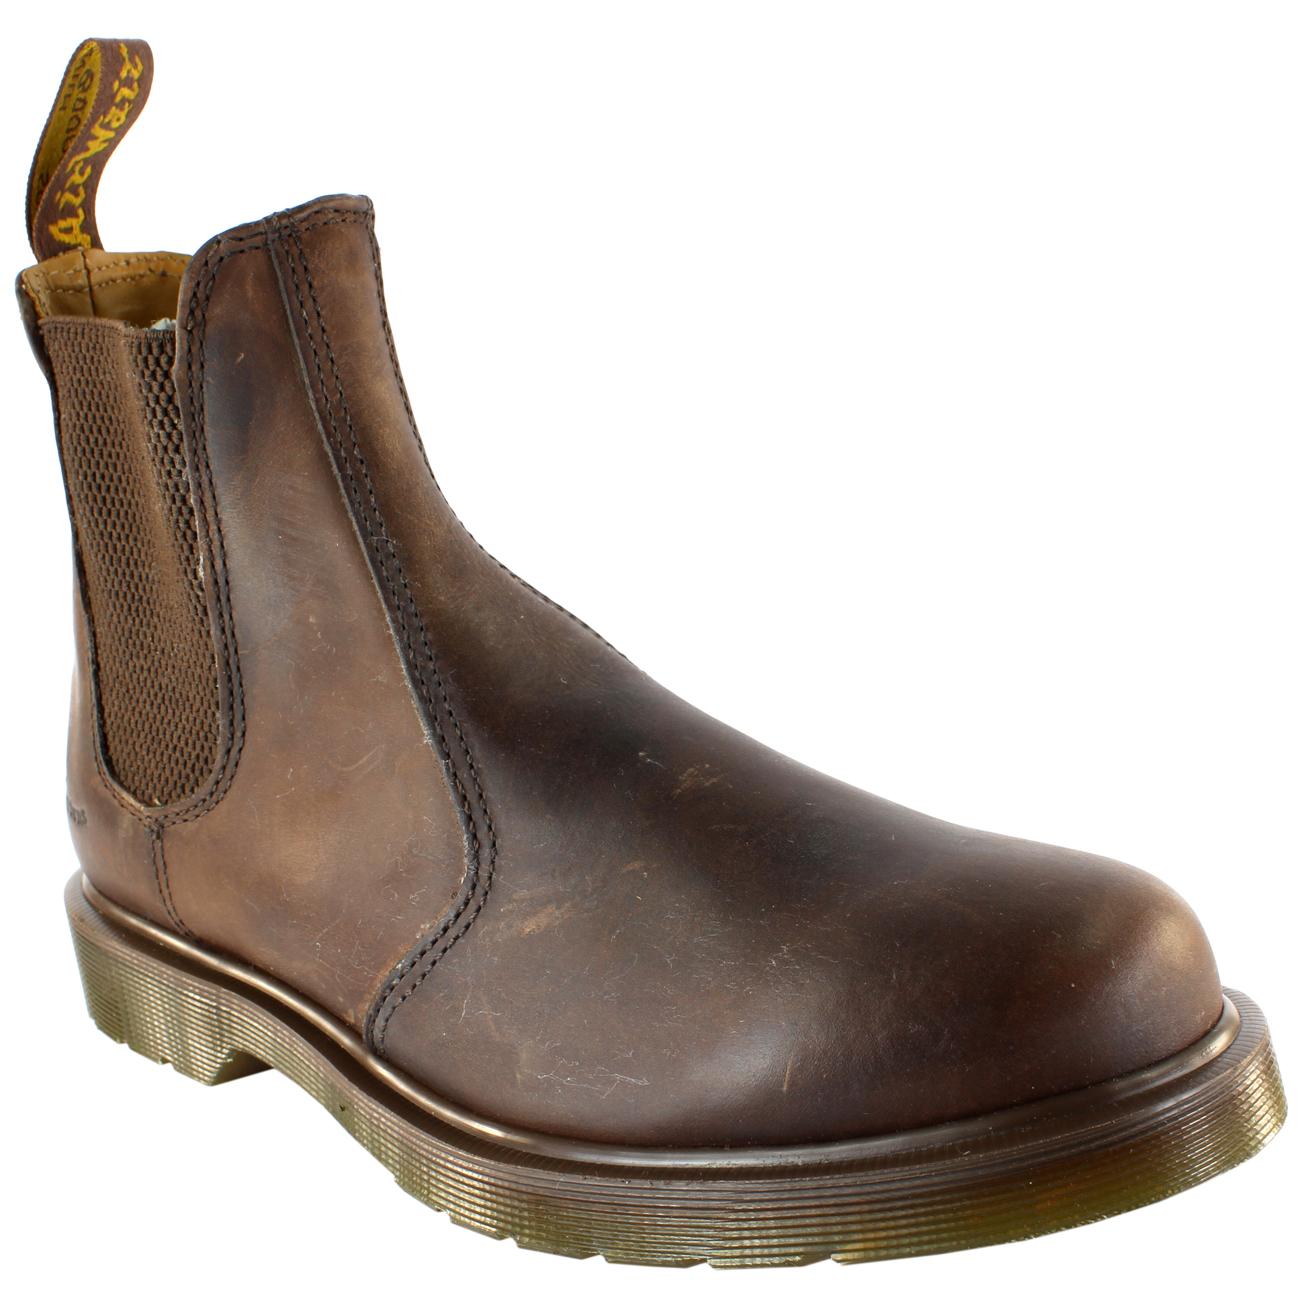 Womens Dr Martens Airwair Leather Chelsea Boot Low Heel ...